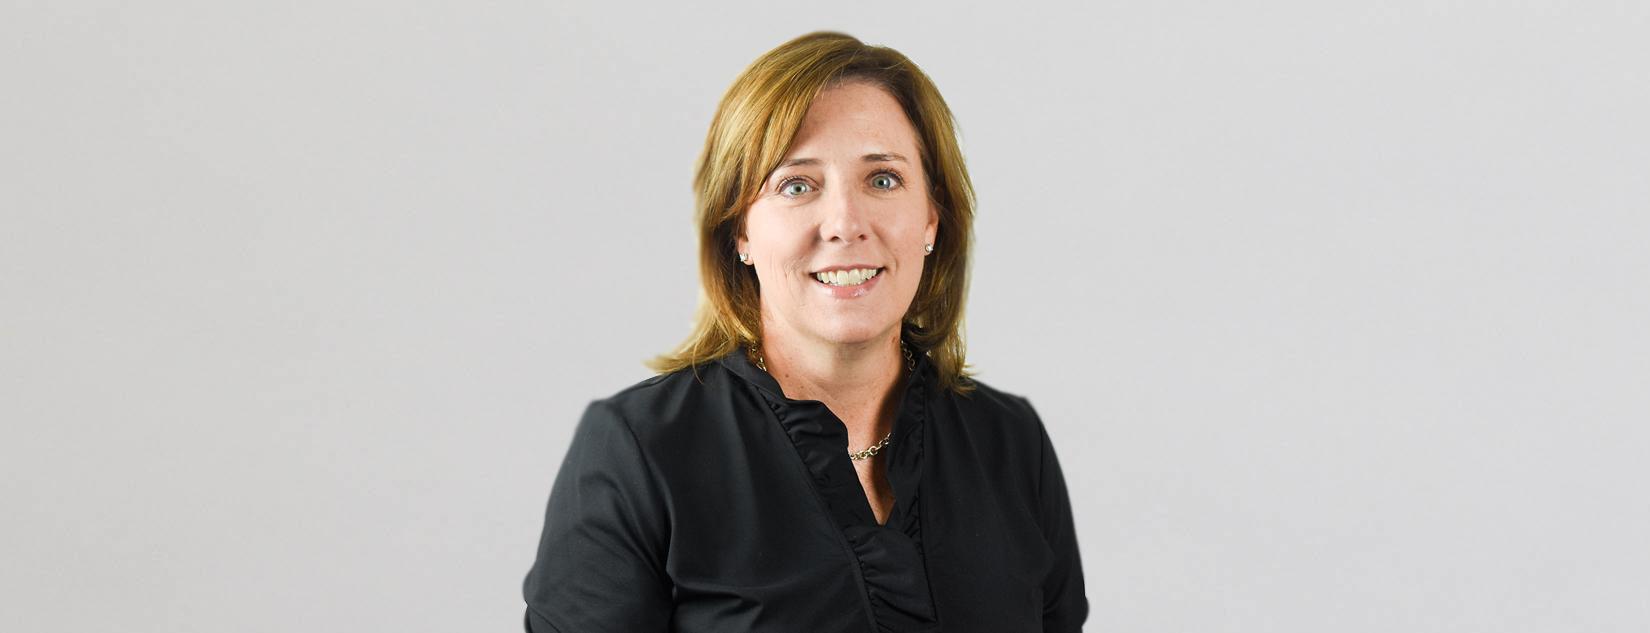 Jenni Moscardelli